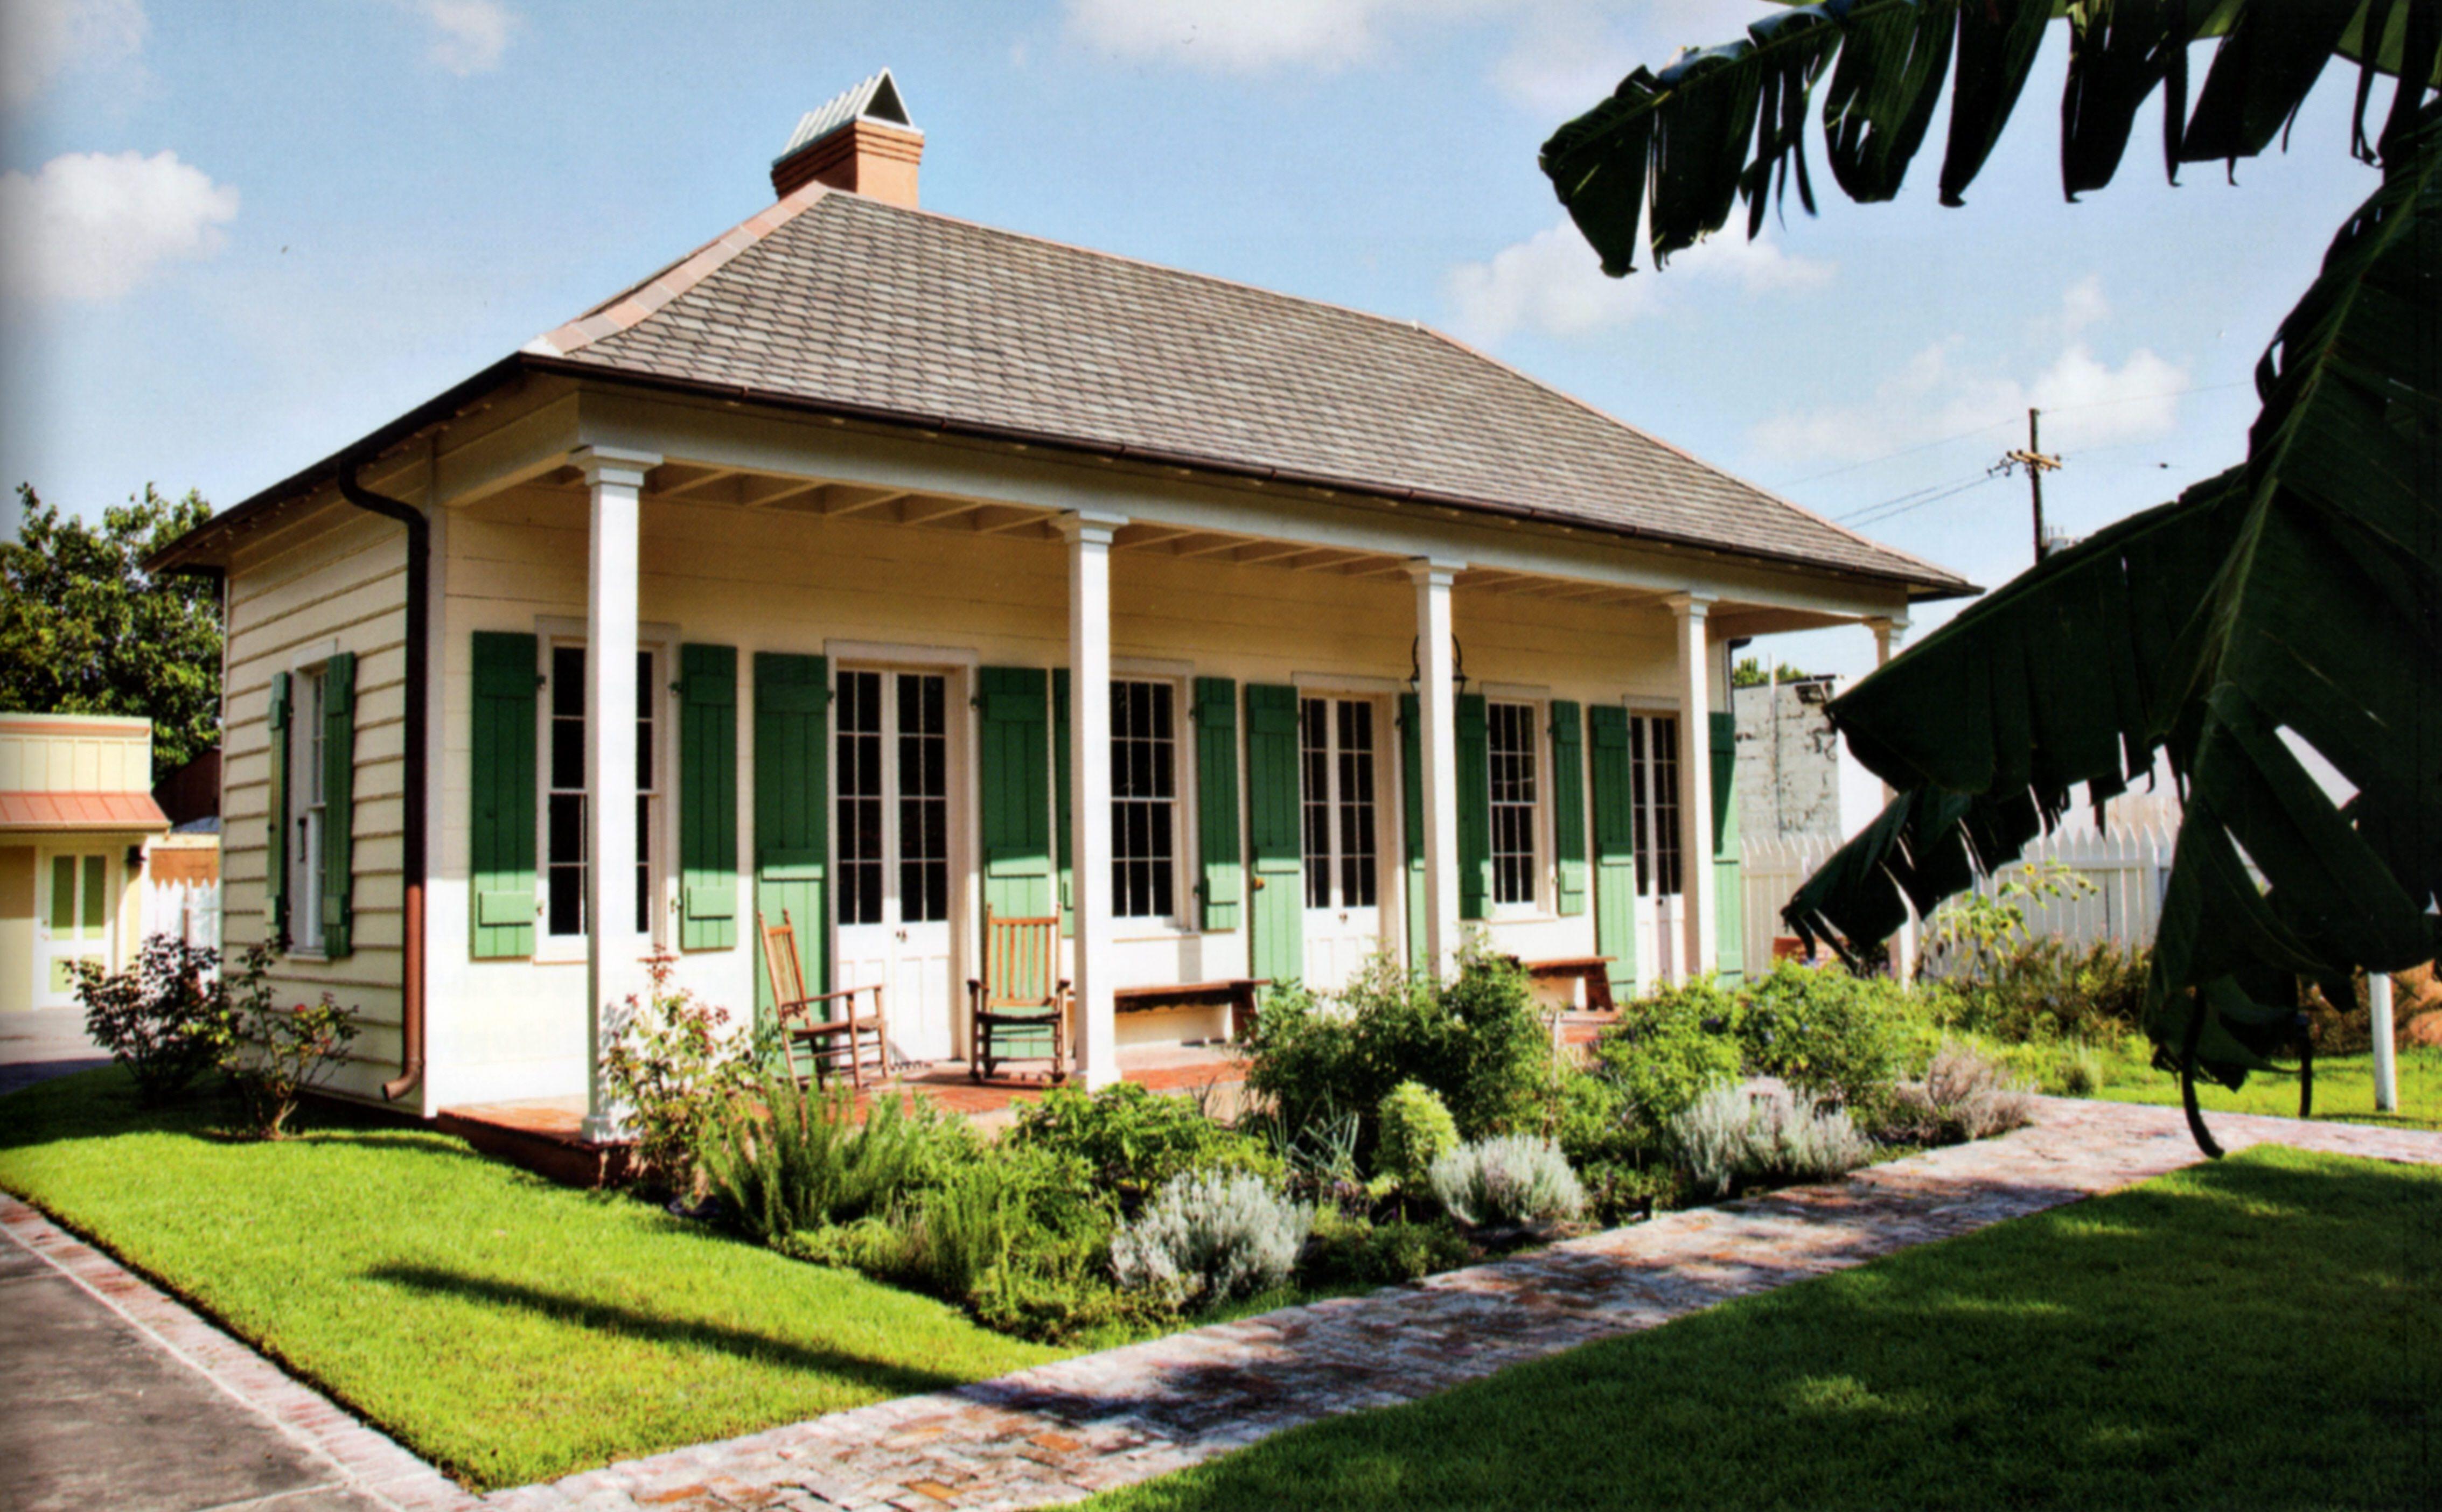 Plantation Kitchen House the lombard plantation reconstructed kitchen house. | spotlight